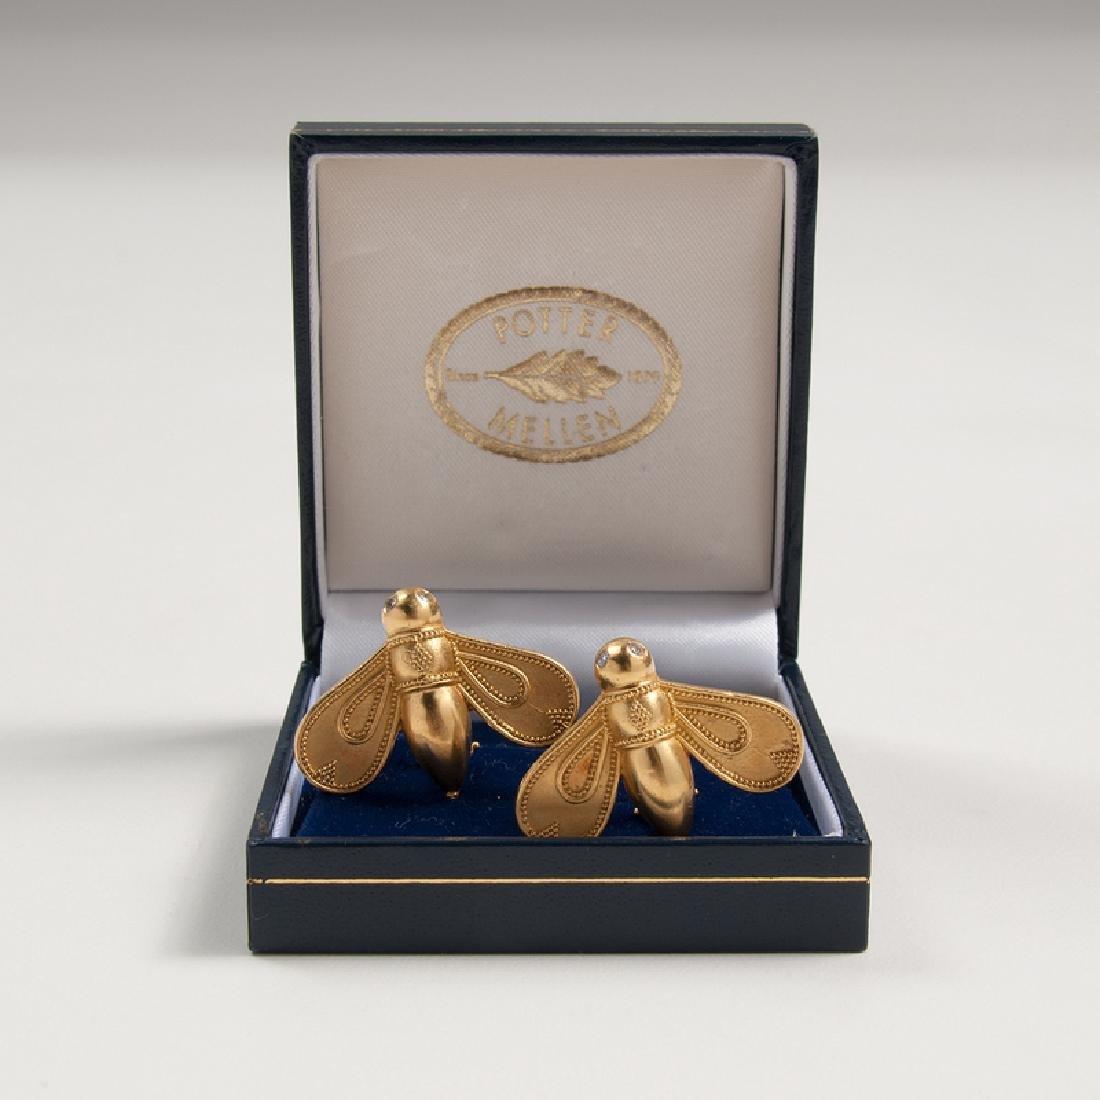 Maija Neimanis for Potter Mellen Bee Earrings